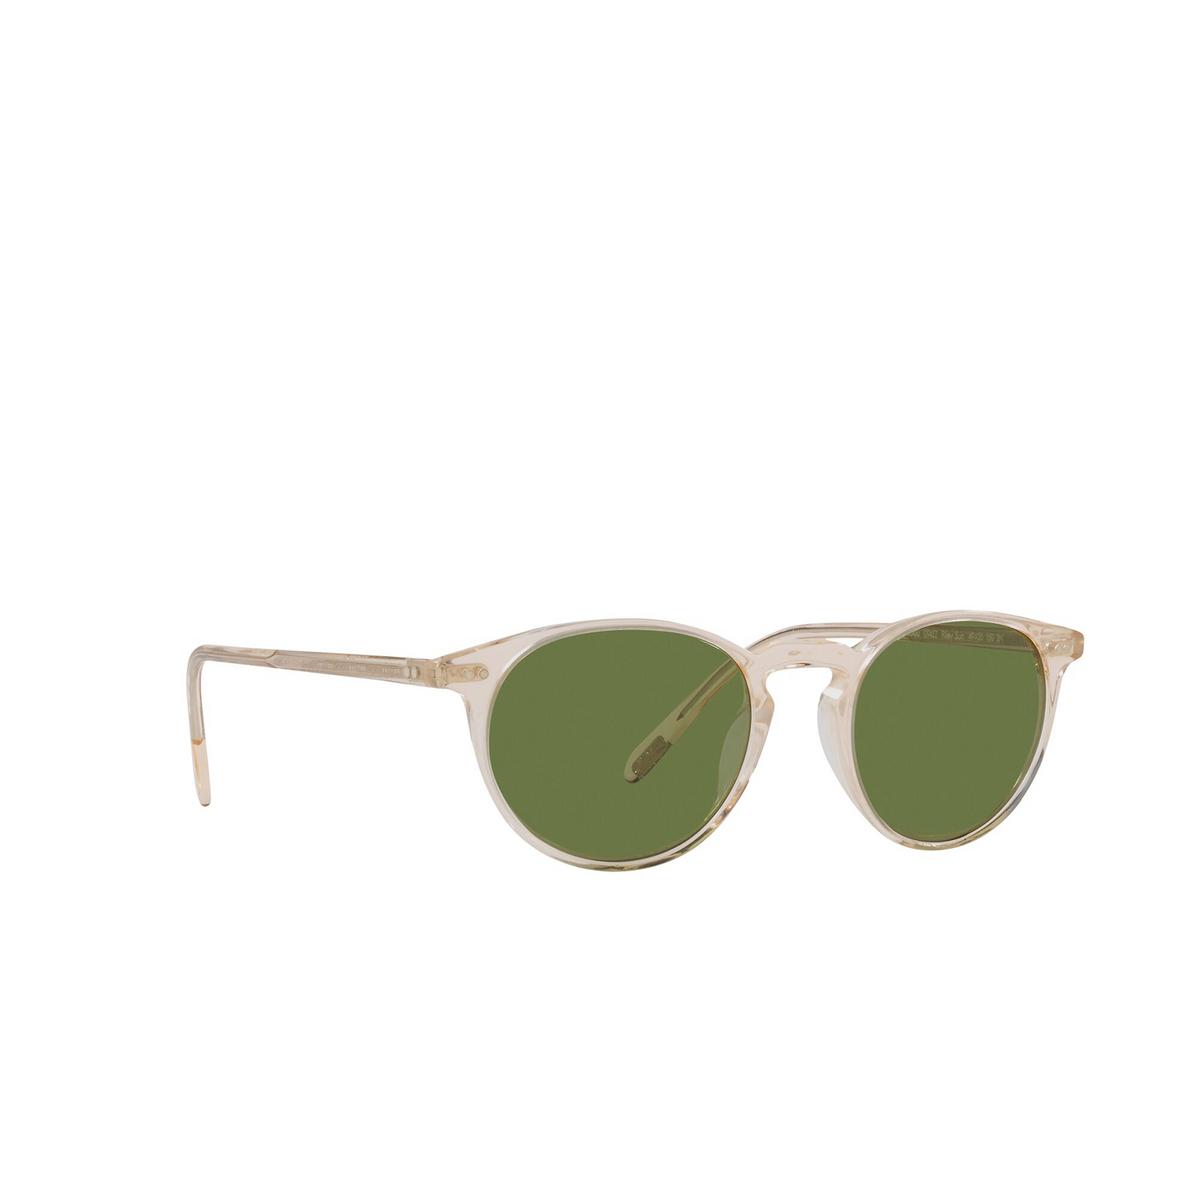 Oliver Peoples® Round Sunglasses: Riley Sun OV5004SU color Buff 109452 - three-quarters view.